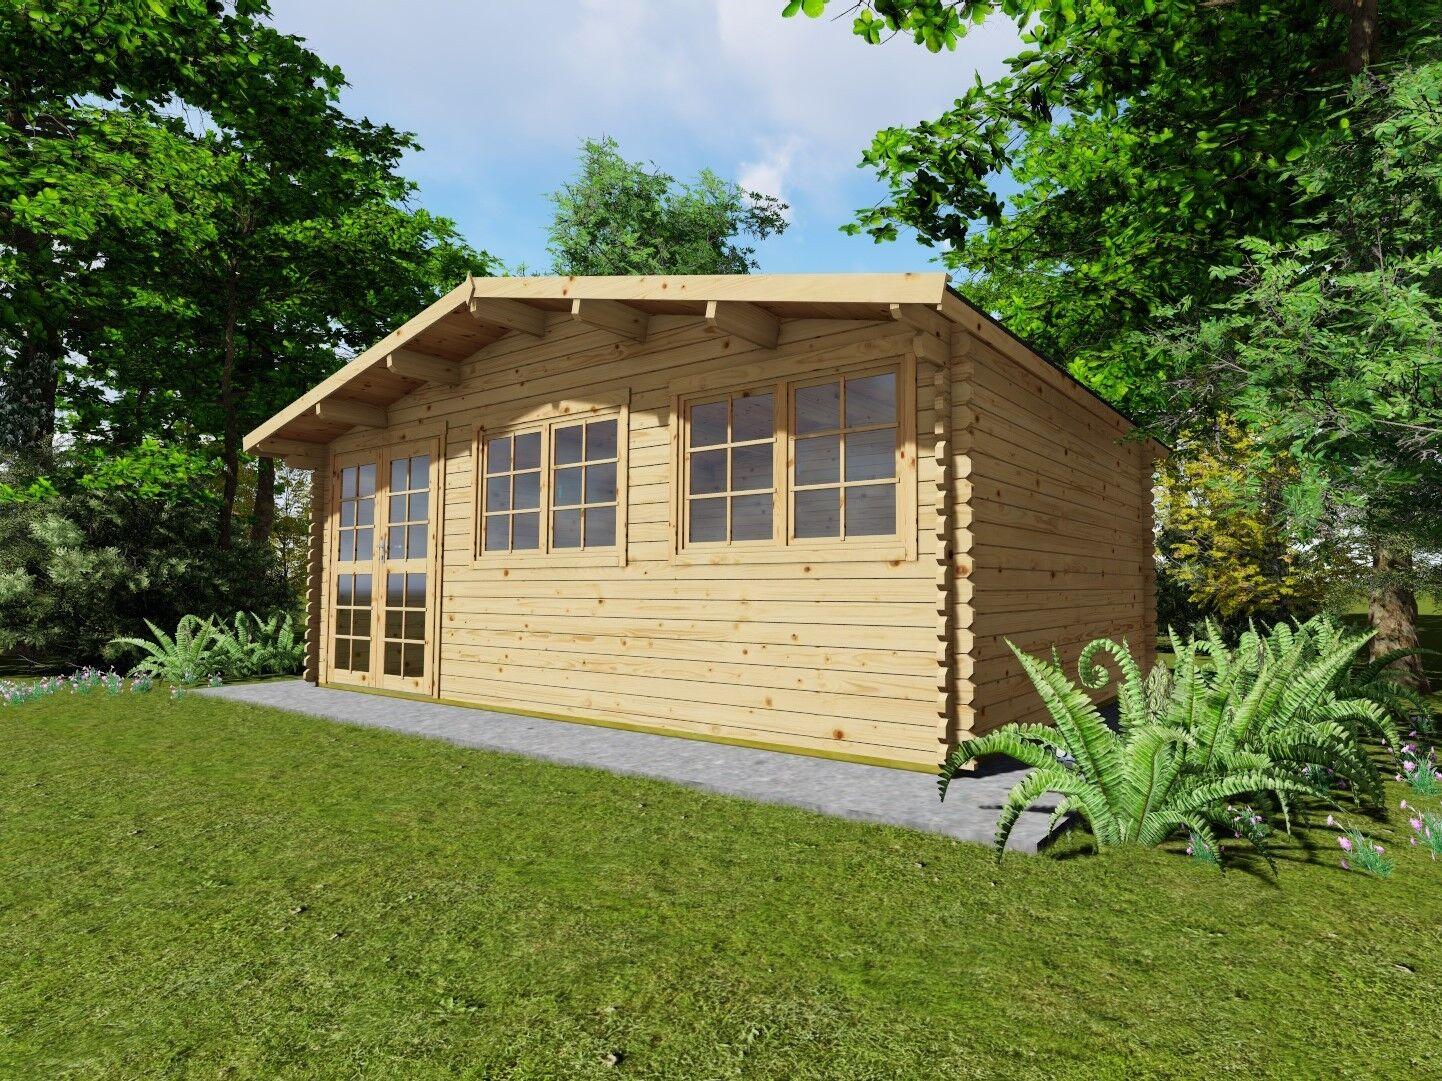 gartenhaus holz fu boden 28mm iso blockhaus 6x3m 0 5m 40mm regensburg 40052f ebay. Black Bedroom Furniture Sets. Home Design Ideas